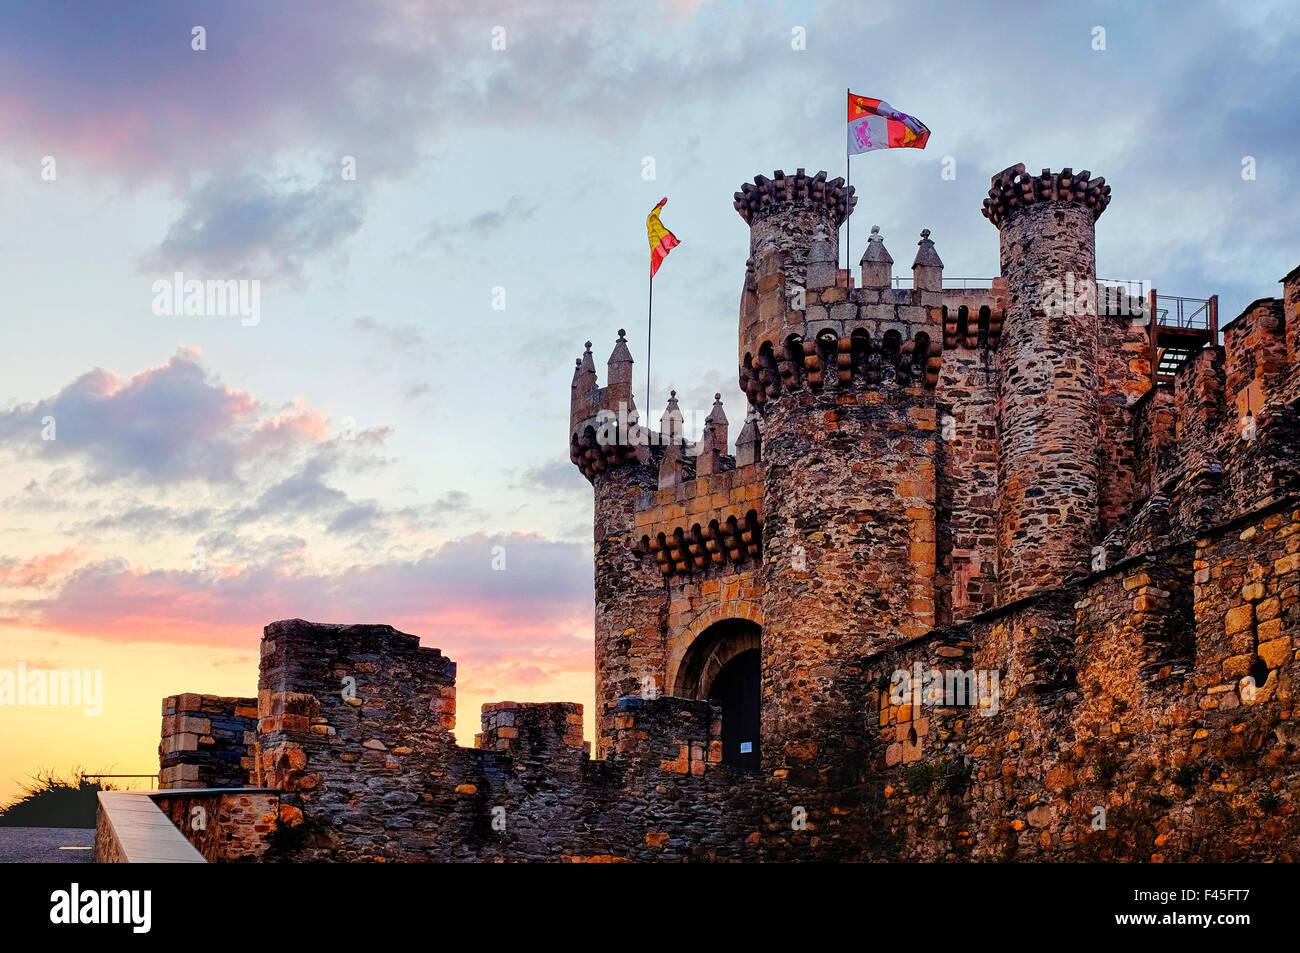 Facade of the knights templar castle at sunset, Ponferrada, Castile and León, Spain - Stock Image